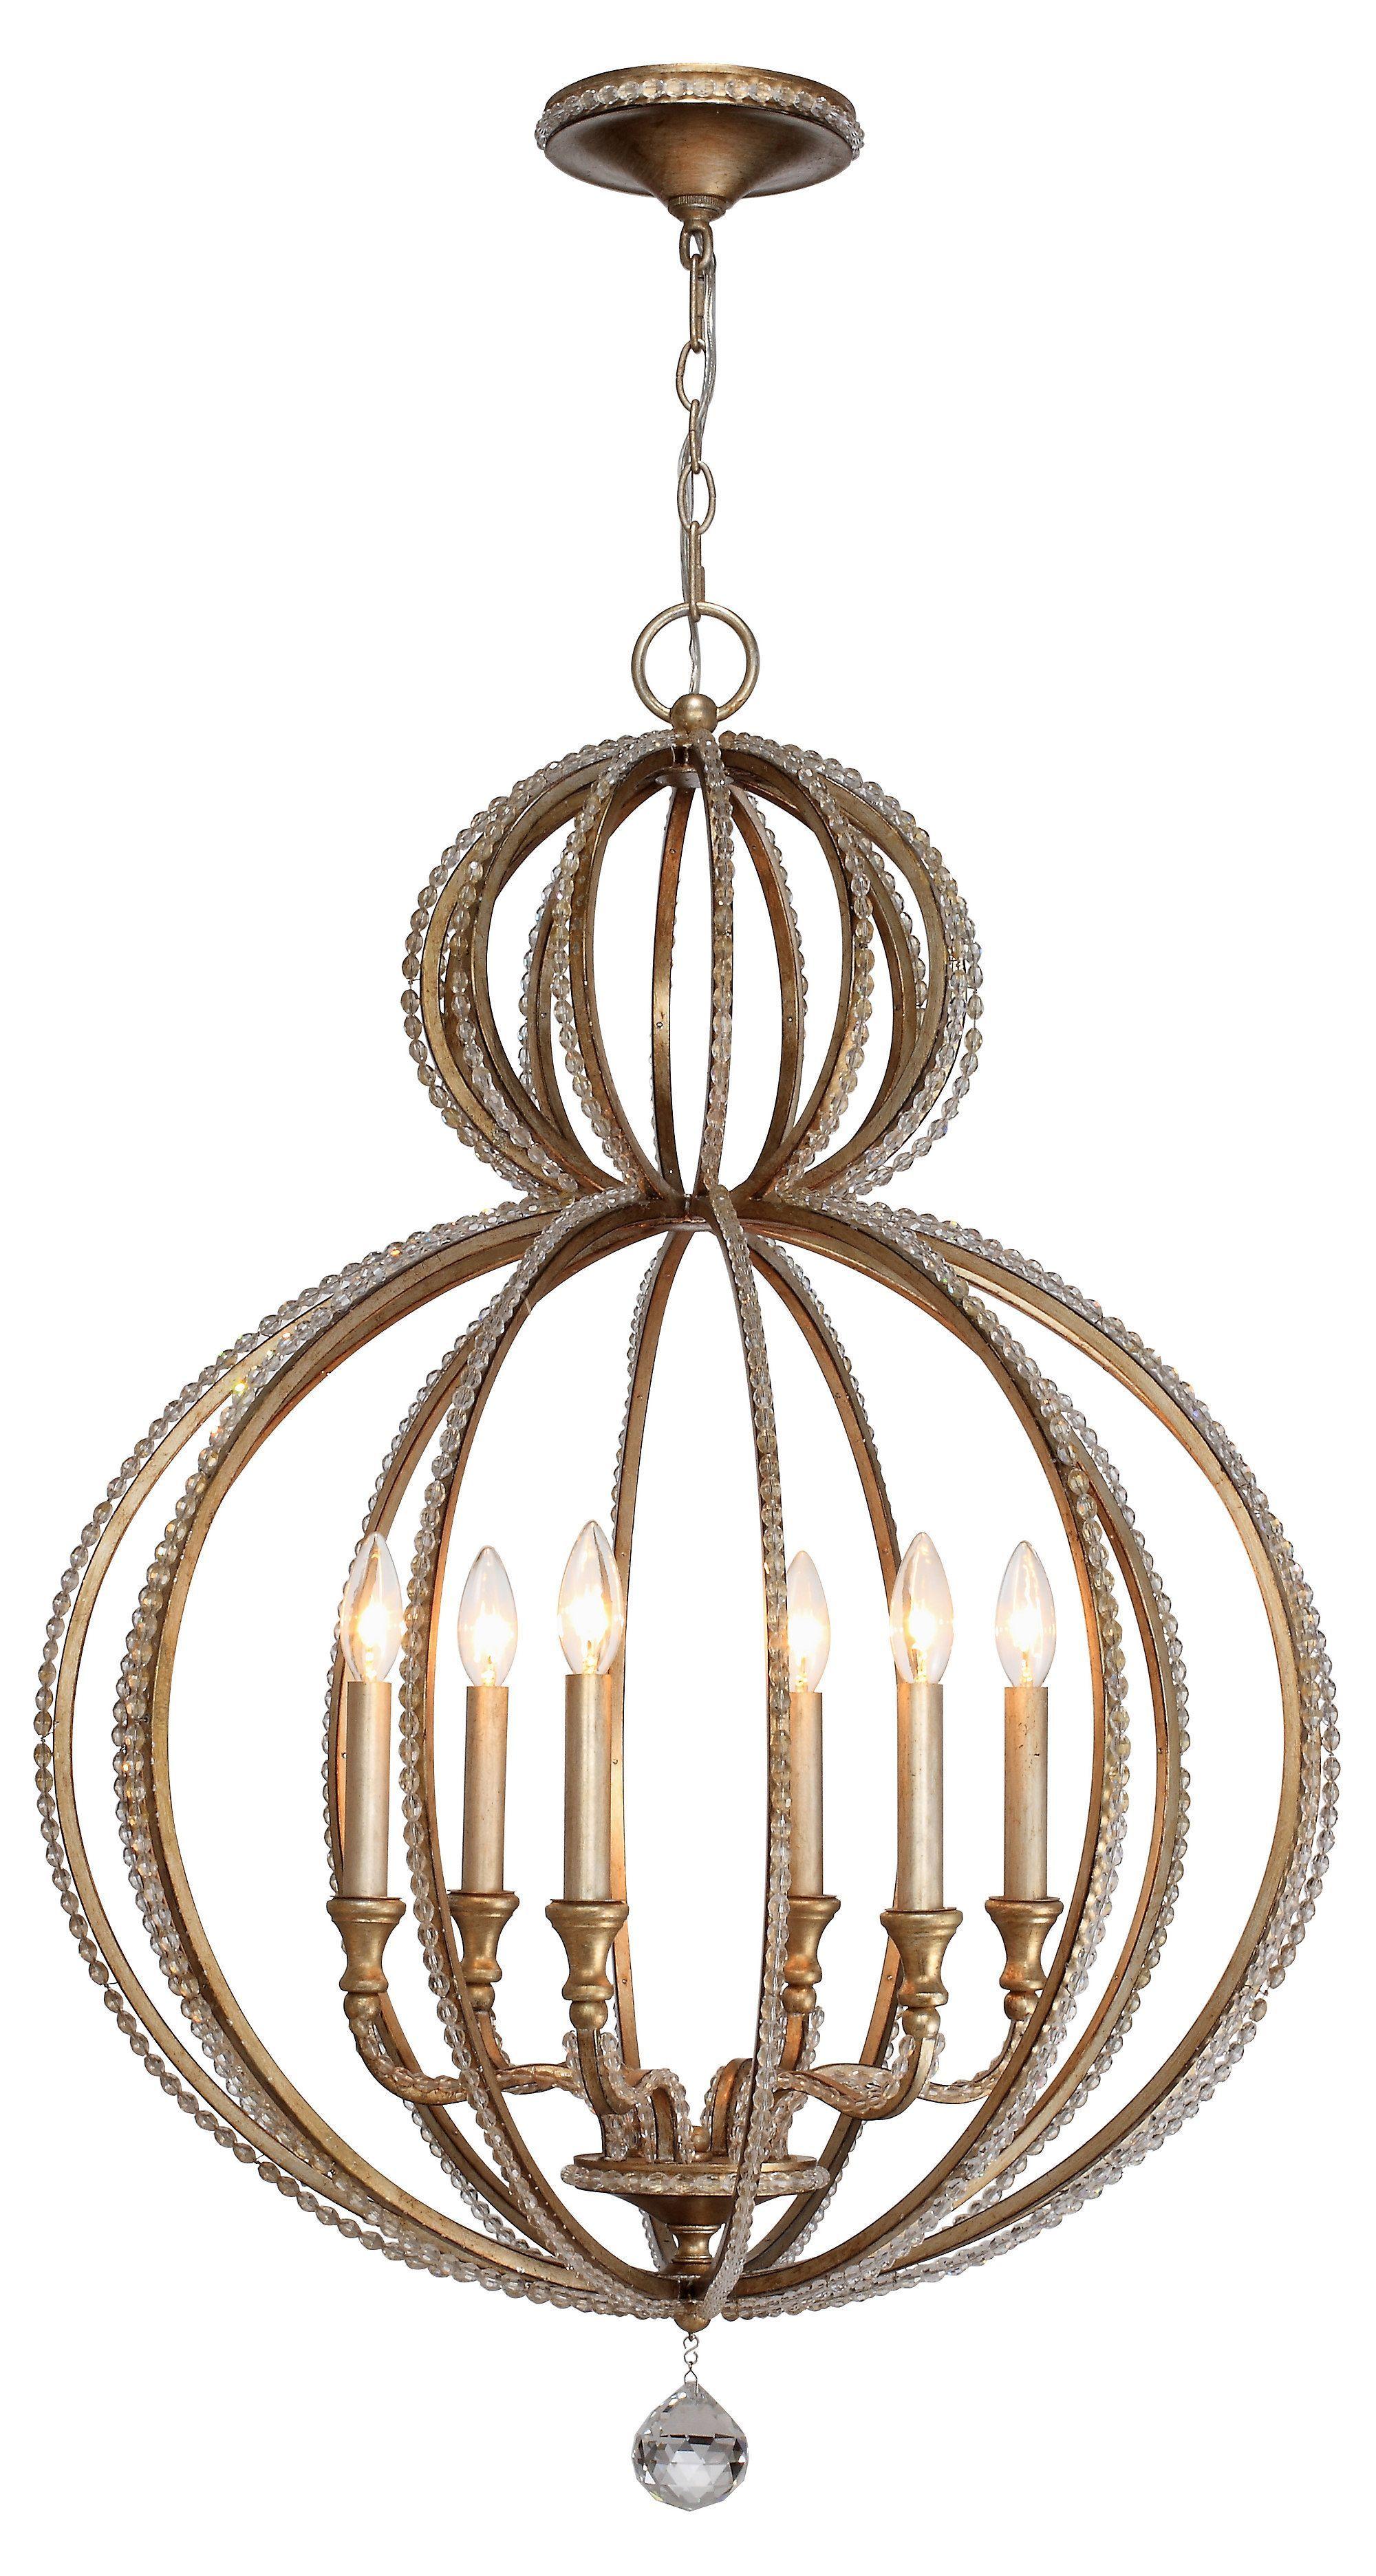 6 light crystal chandelier twilight one kings lane d 6 light crystal chandelier twilight one kings lane arubaitofo Images